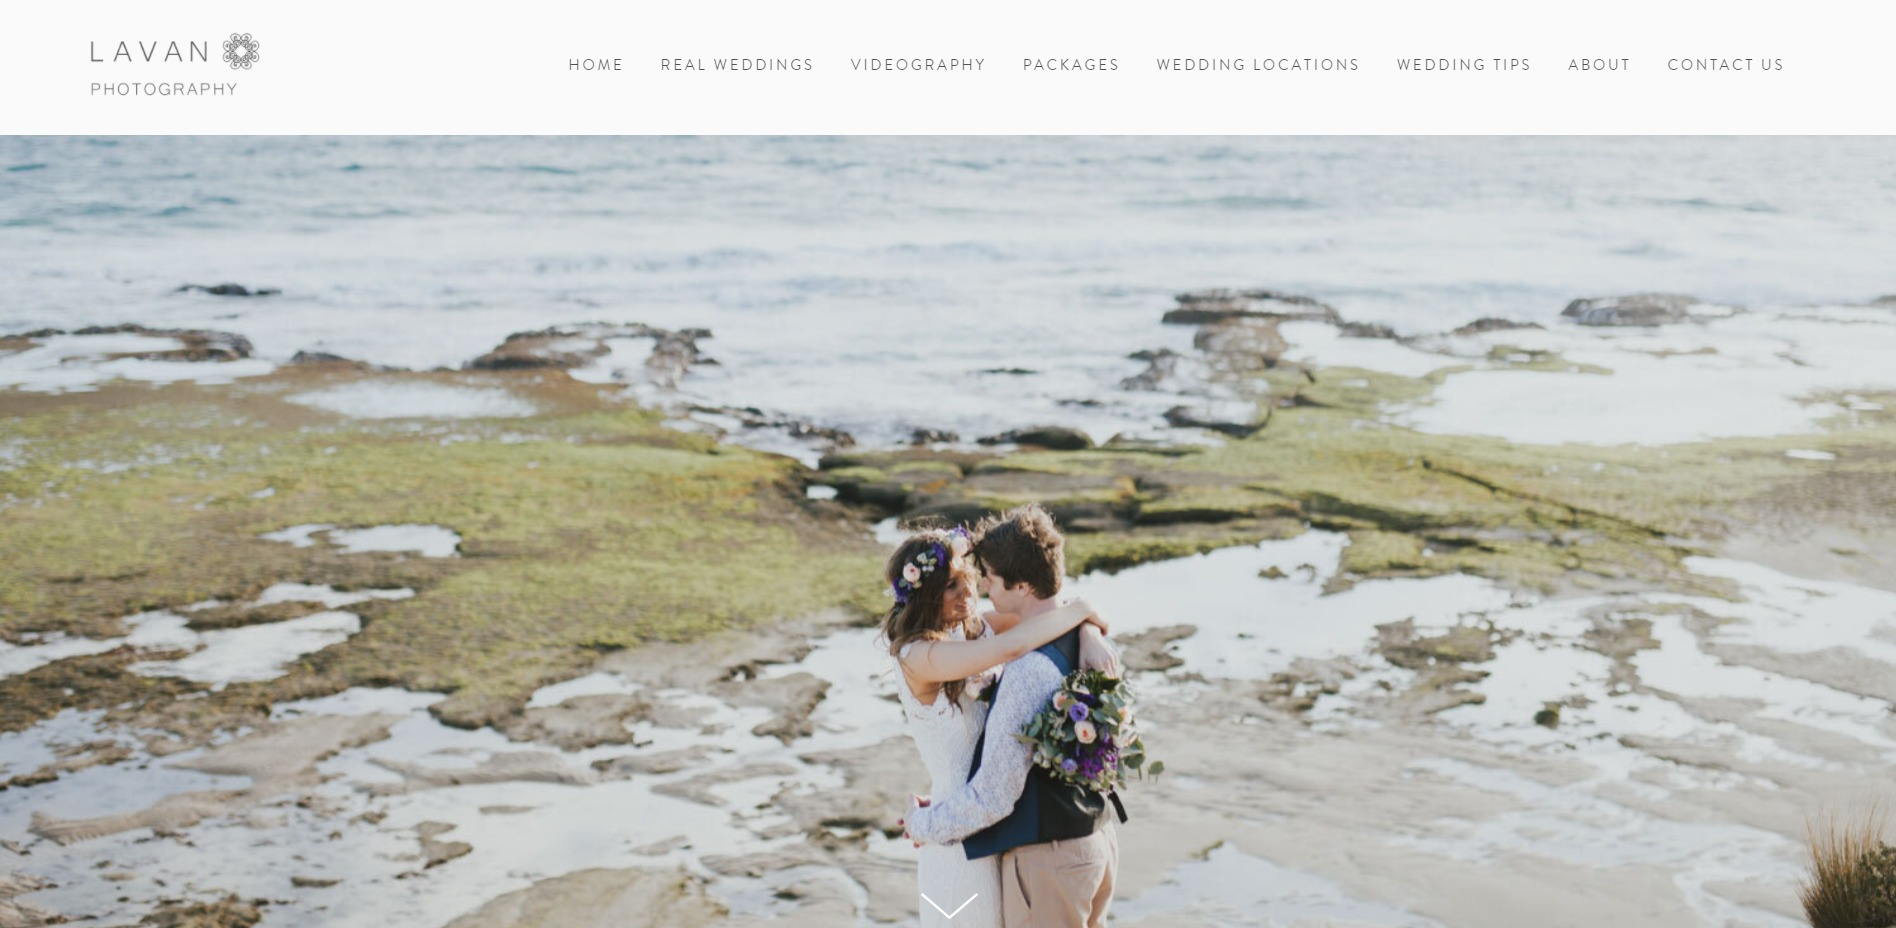 Lavan Wedding Photography & Videography Melbourne